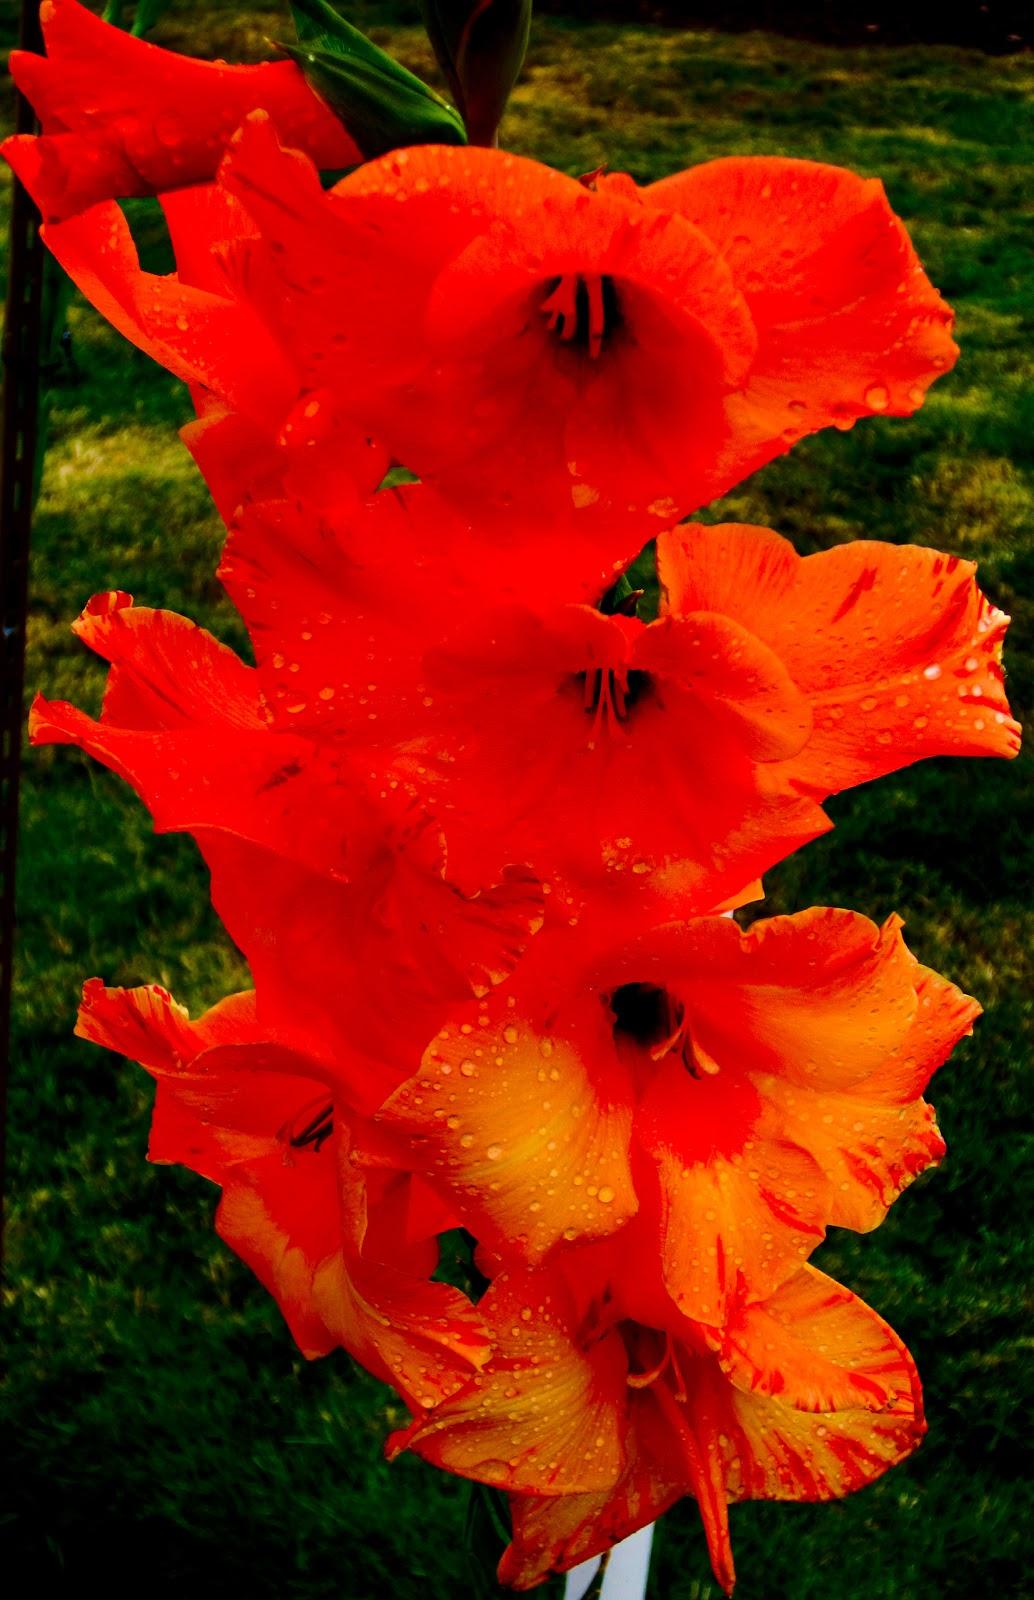 Thom Zehrfeld graphy Gladiolus Flower Gardens